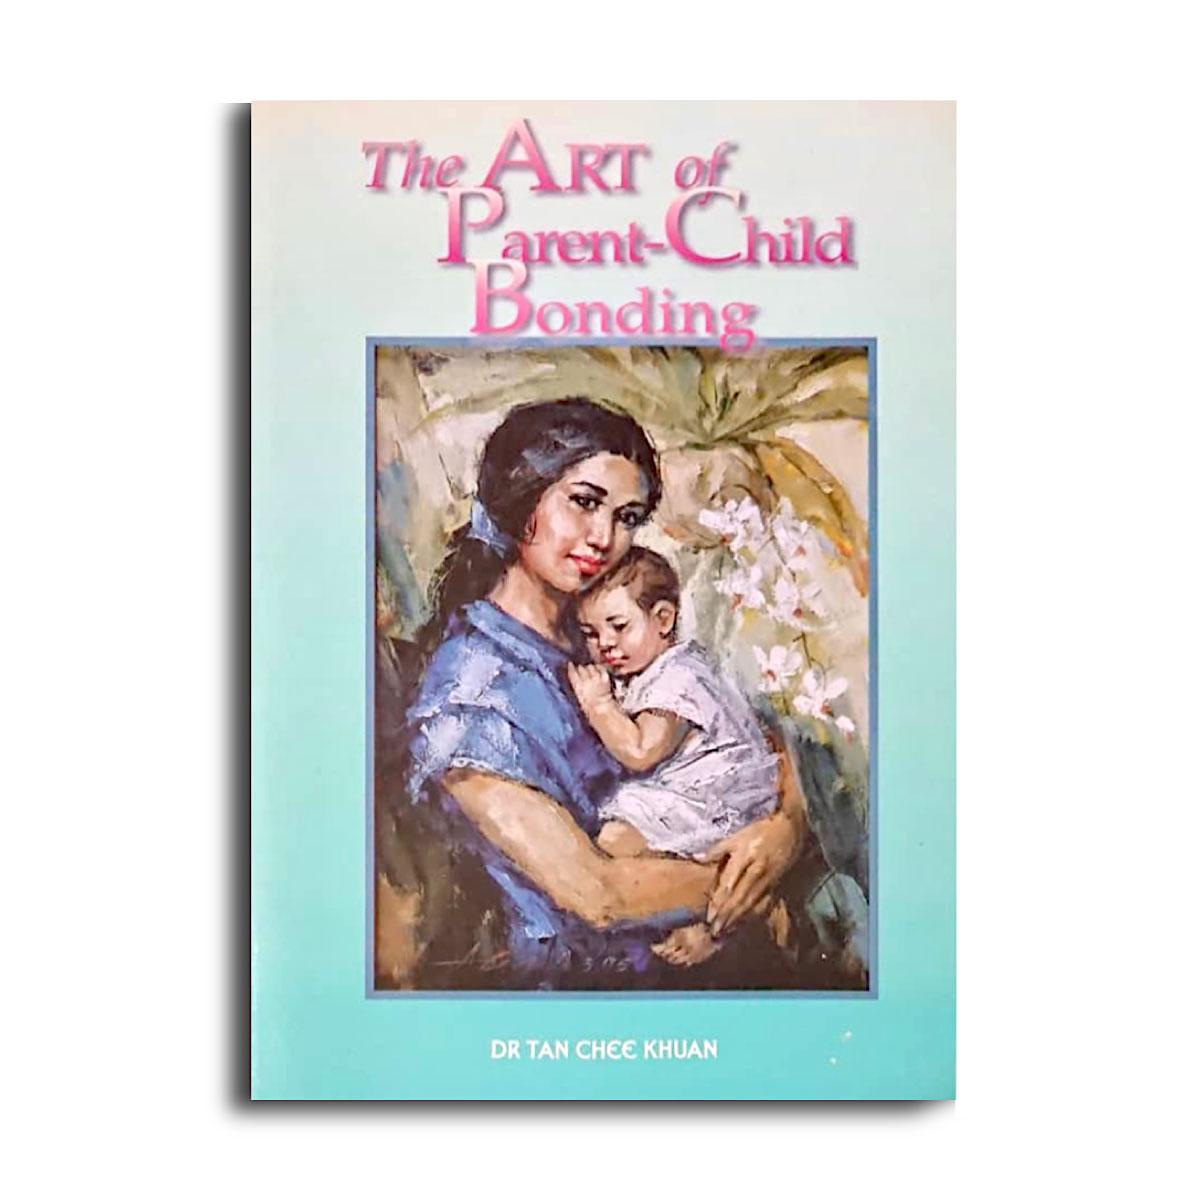 The Art of Parent-Child Bonding